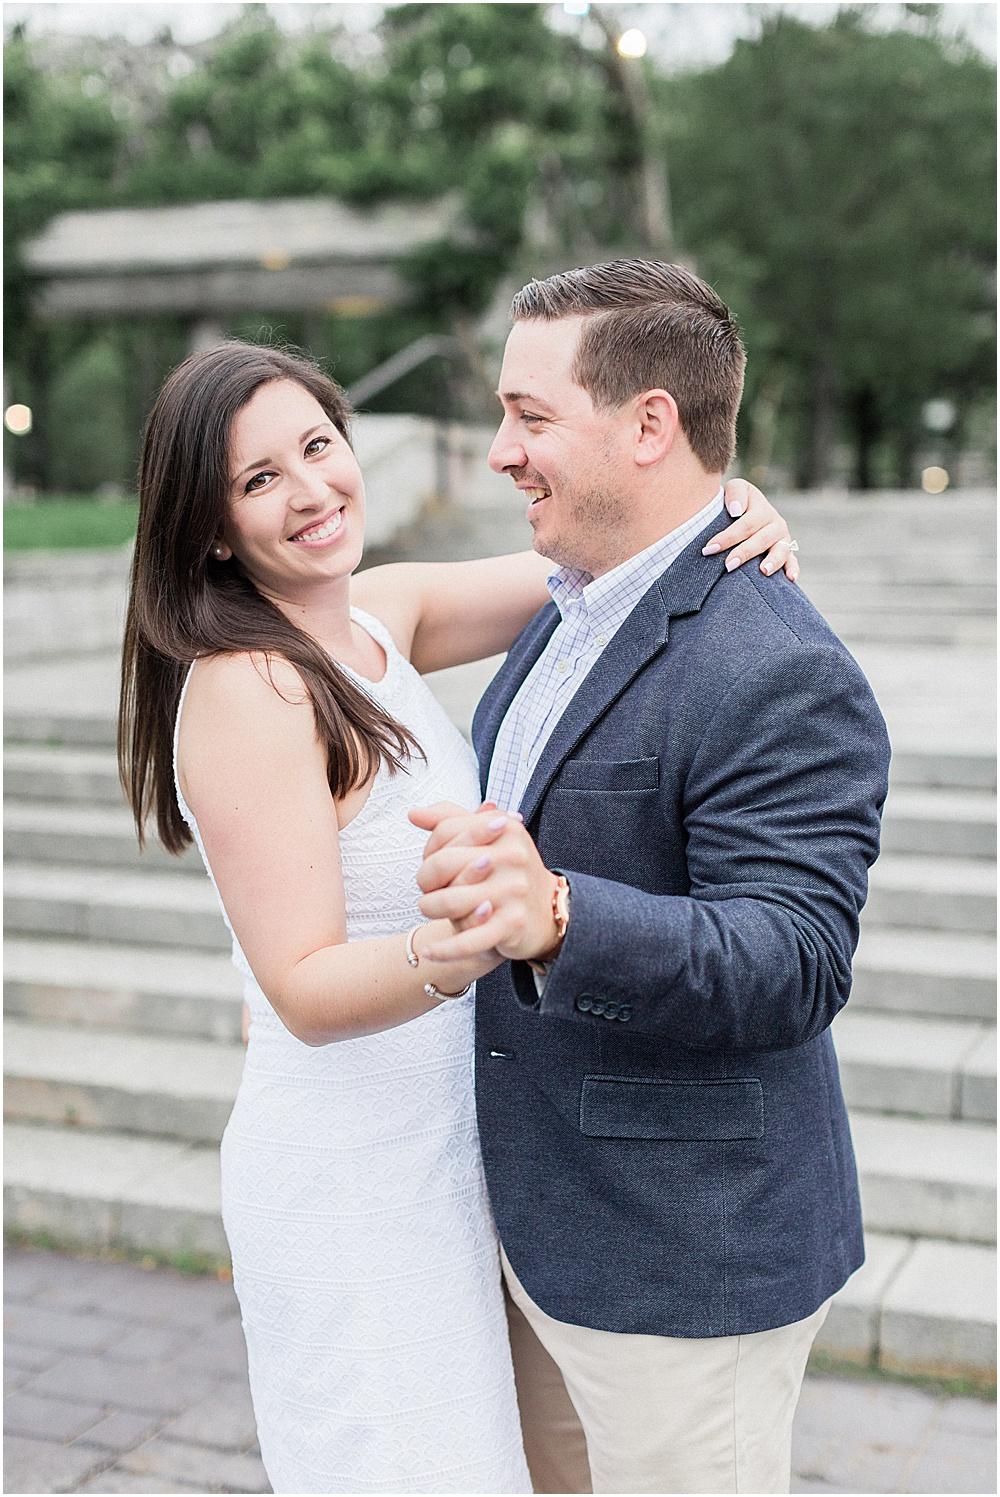 christopher_columbus_park_north_end_harbor_engagement_session_massachusetts_boston_wedding_photographer_meredith_jane_photography_photo_0437.jpg